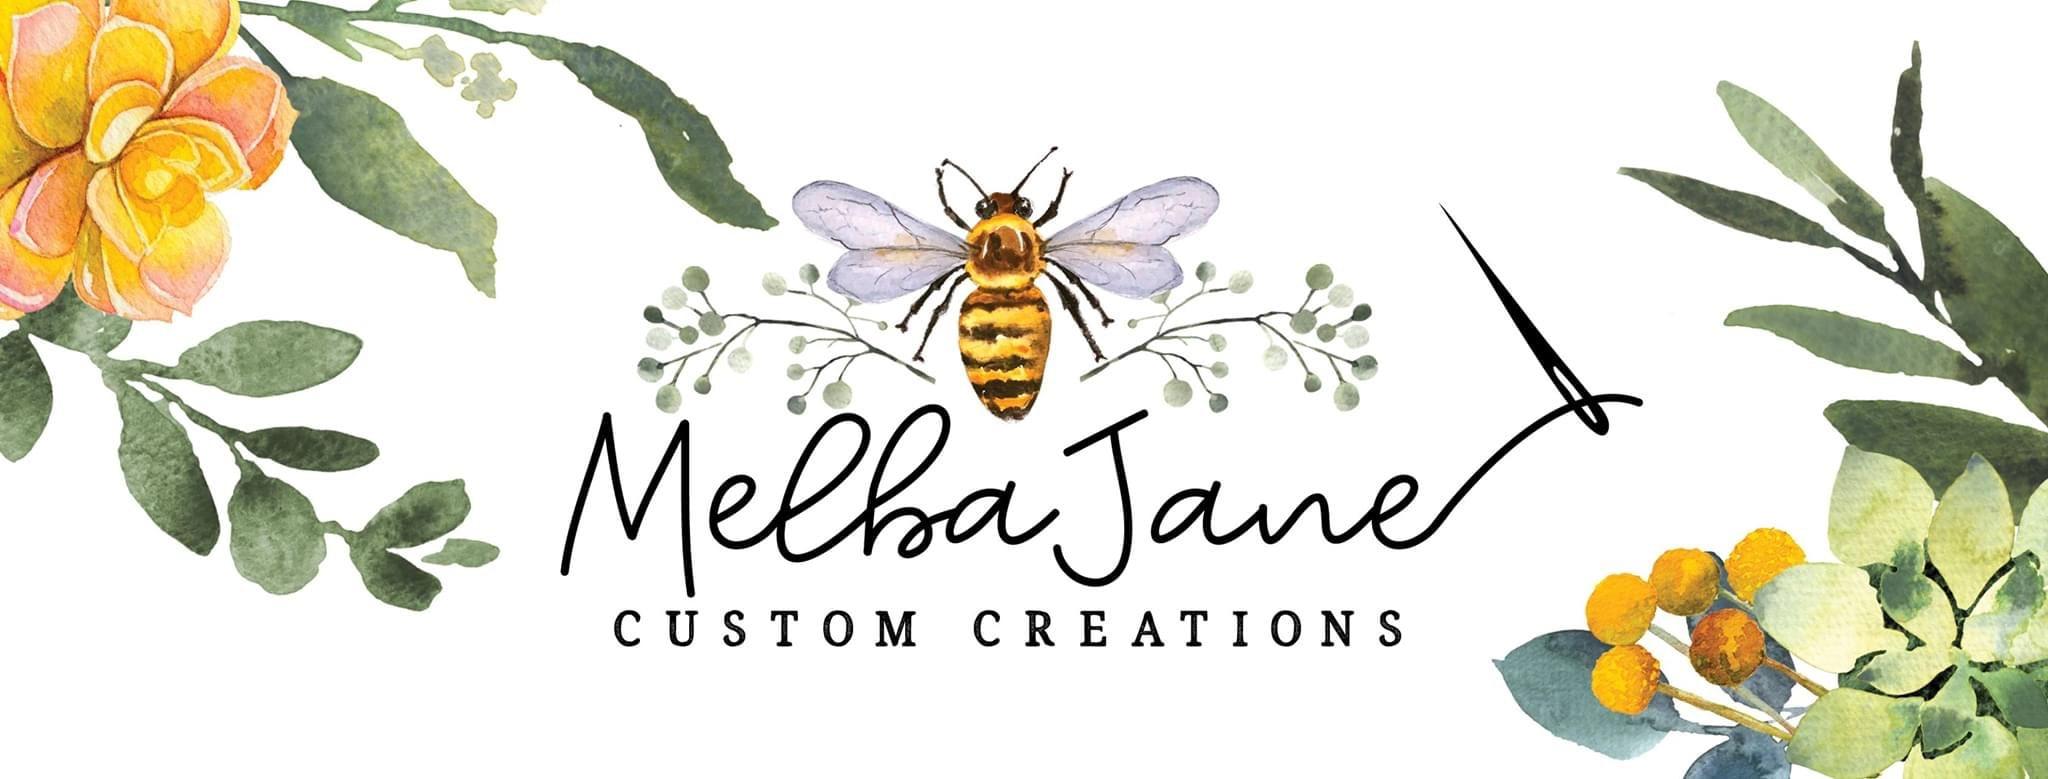 MelbaJane Custom Creations